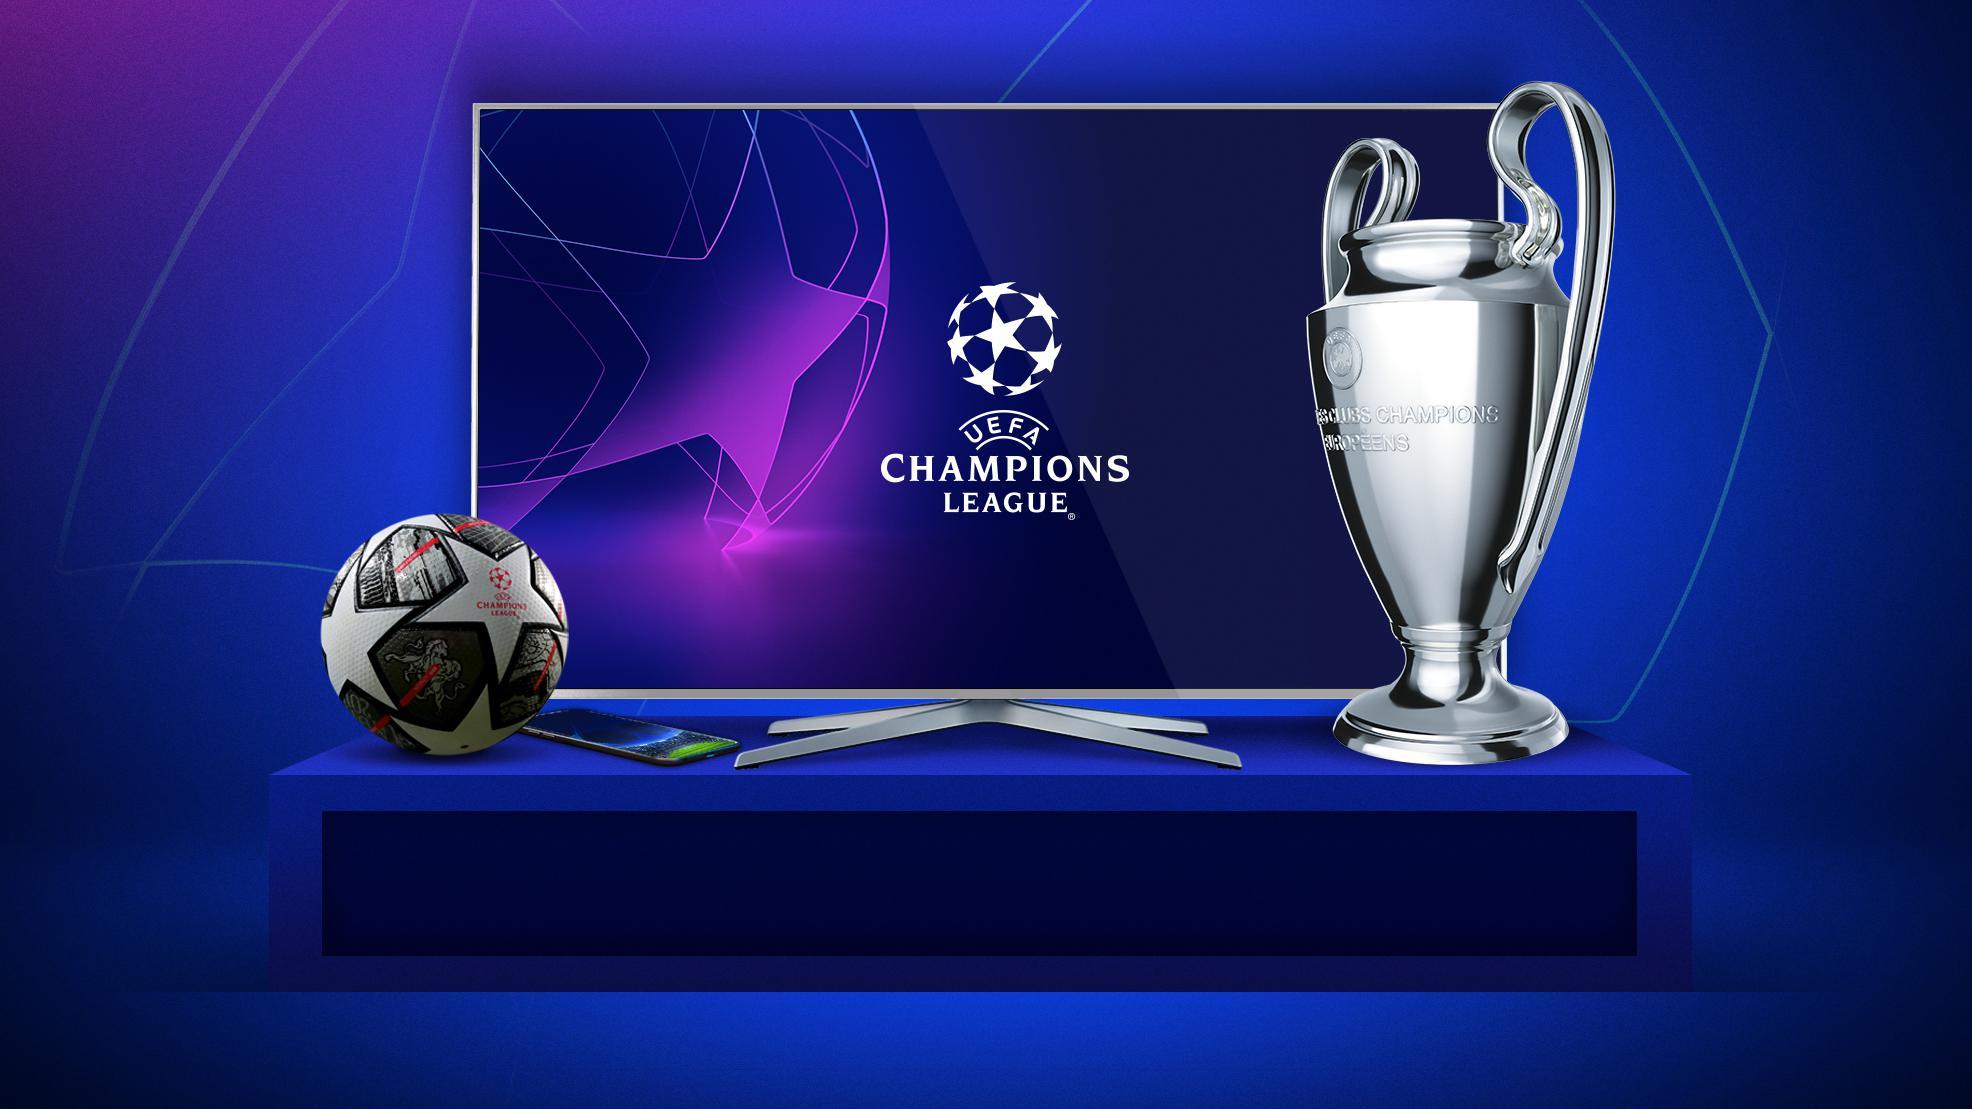 HBO Max transmitirá UEFA Champions League ao vivo no Brasil